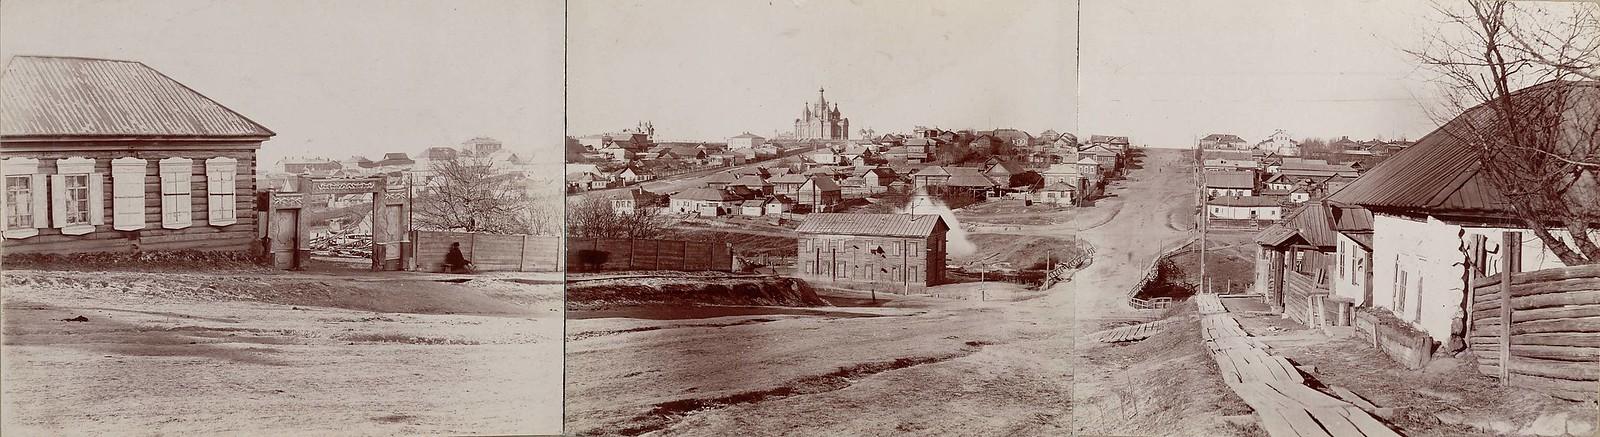 Хабаровск. Панорама города